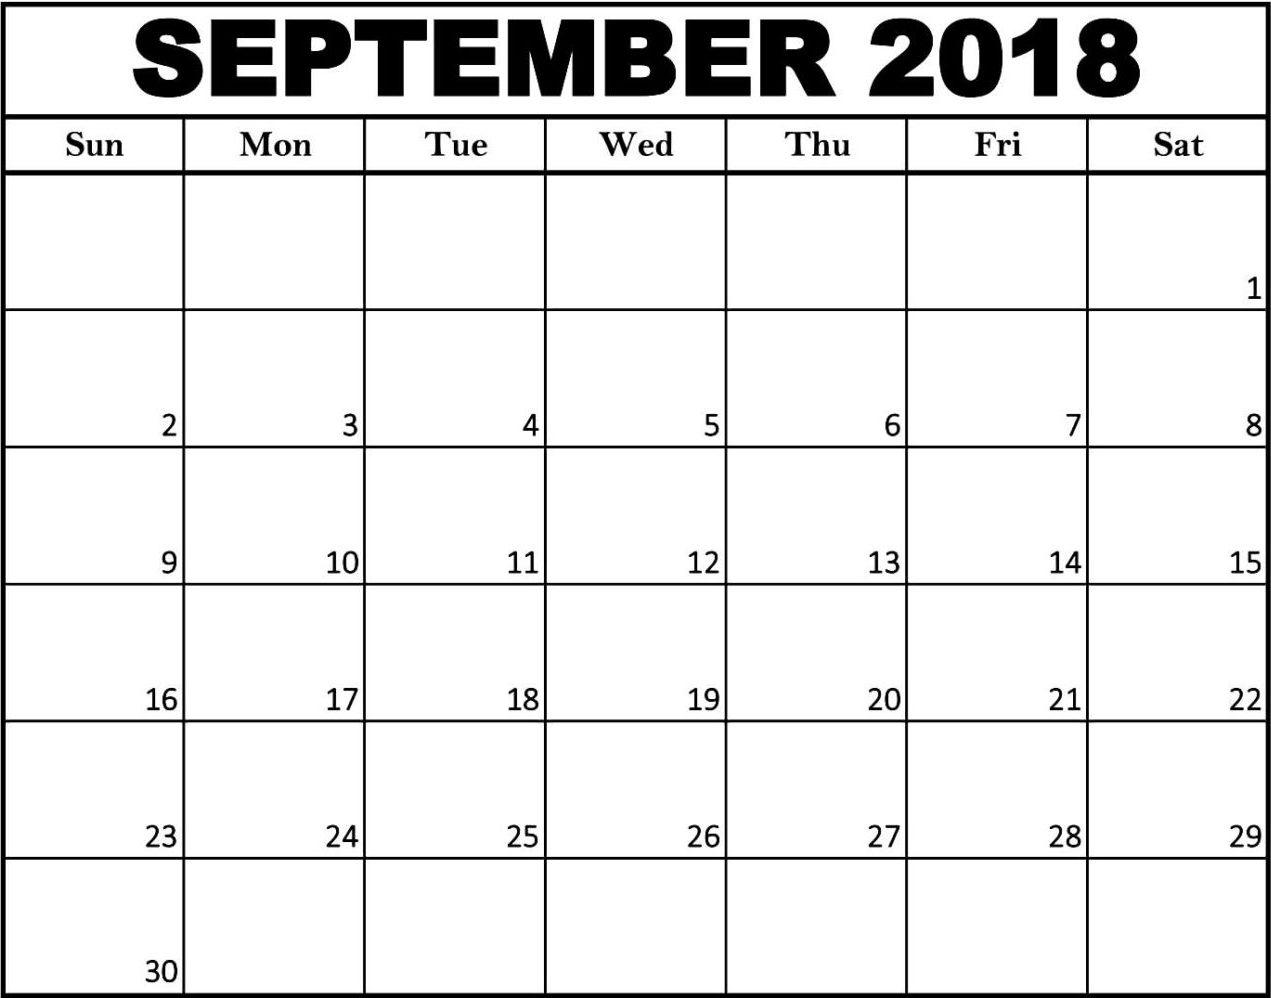 September Calendar 2018 Template throughout September Printable Monthly Calendars Blank